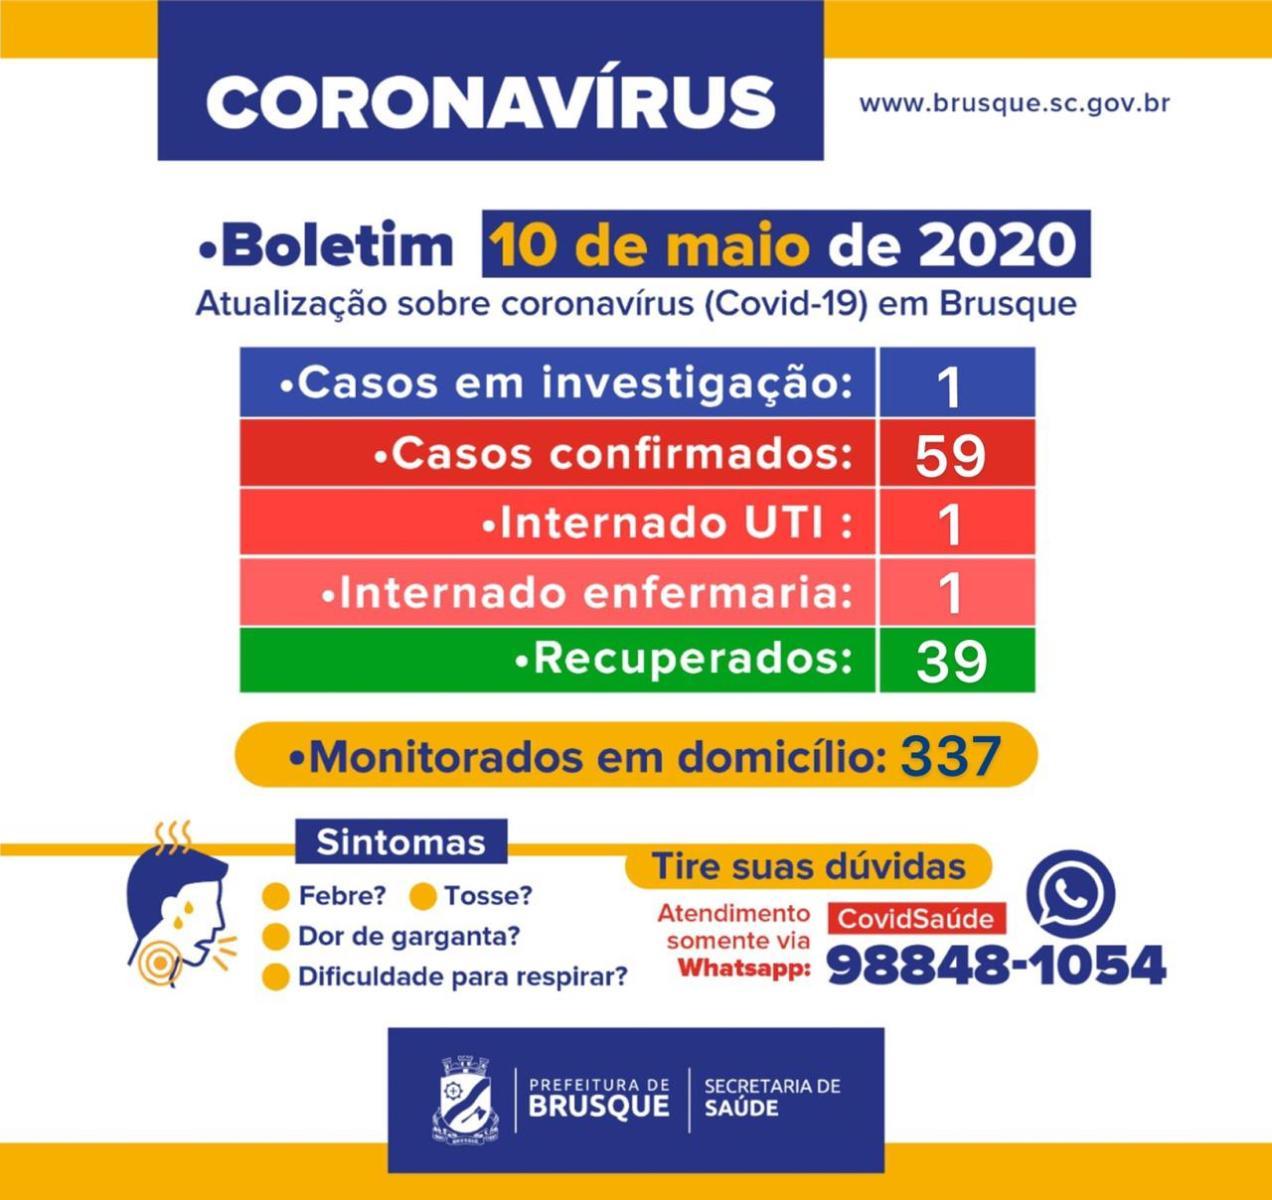 Brusque contabiliza 59 casos confirmados do COVID-19